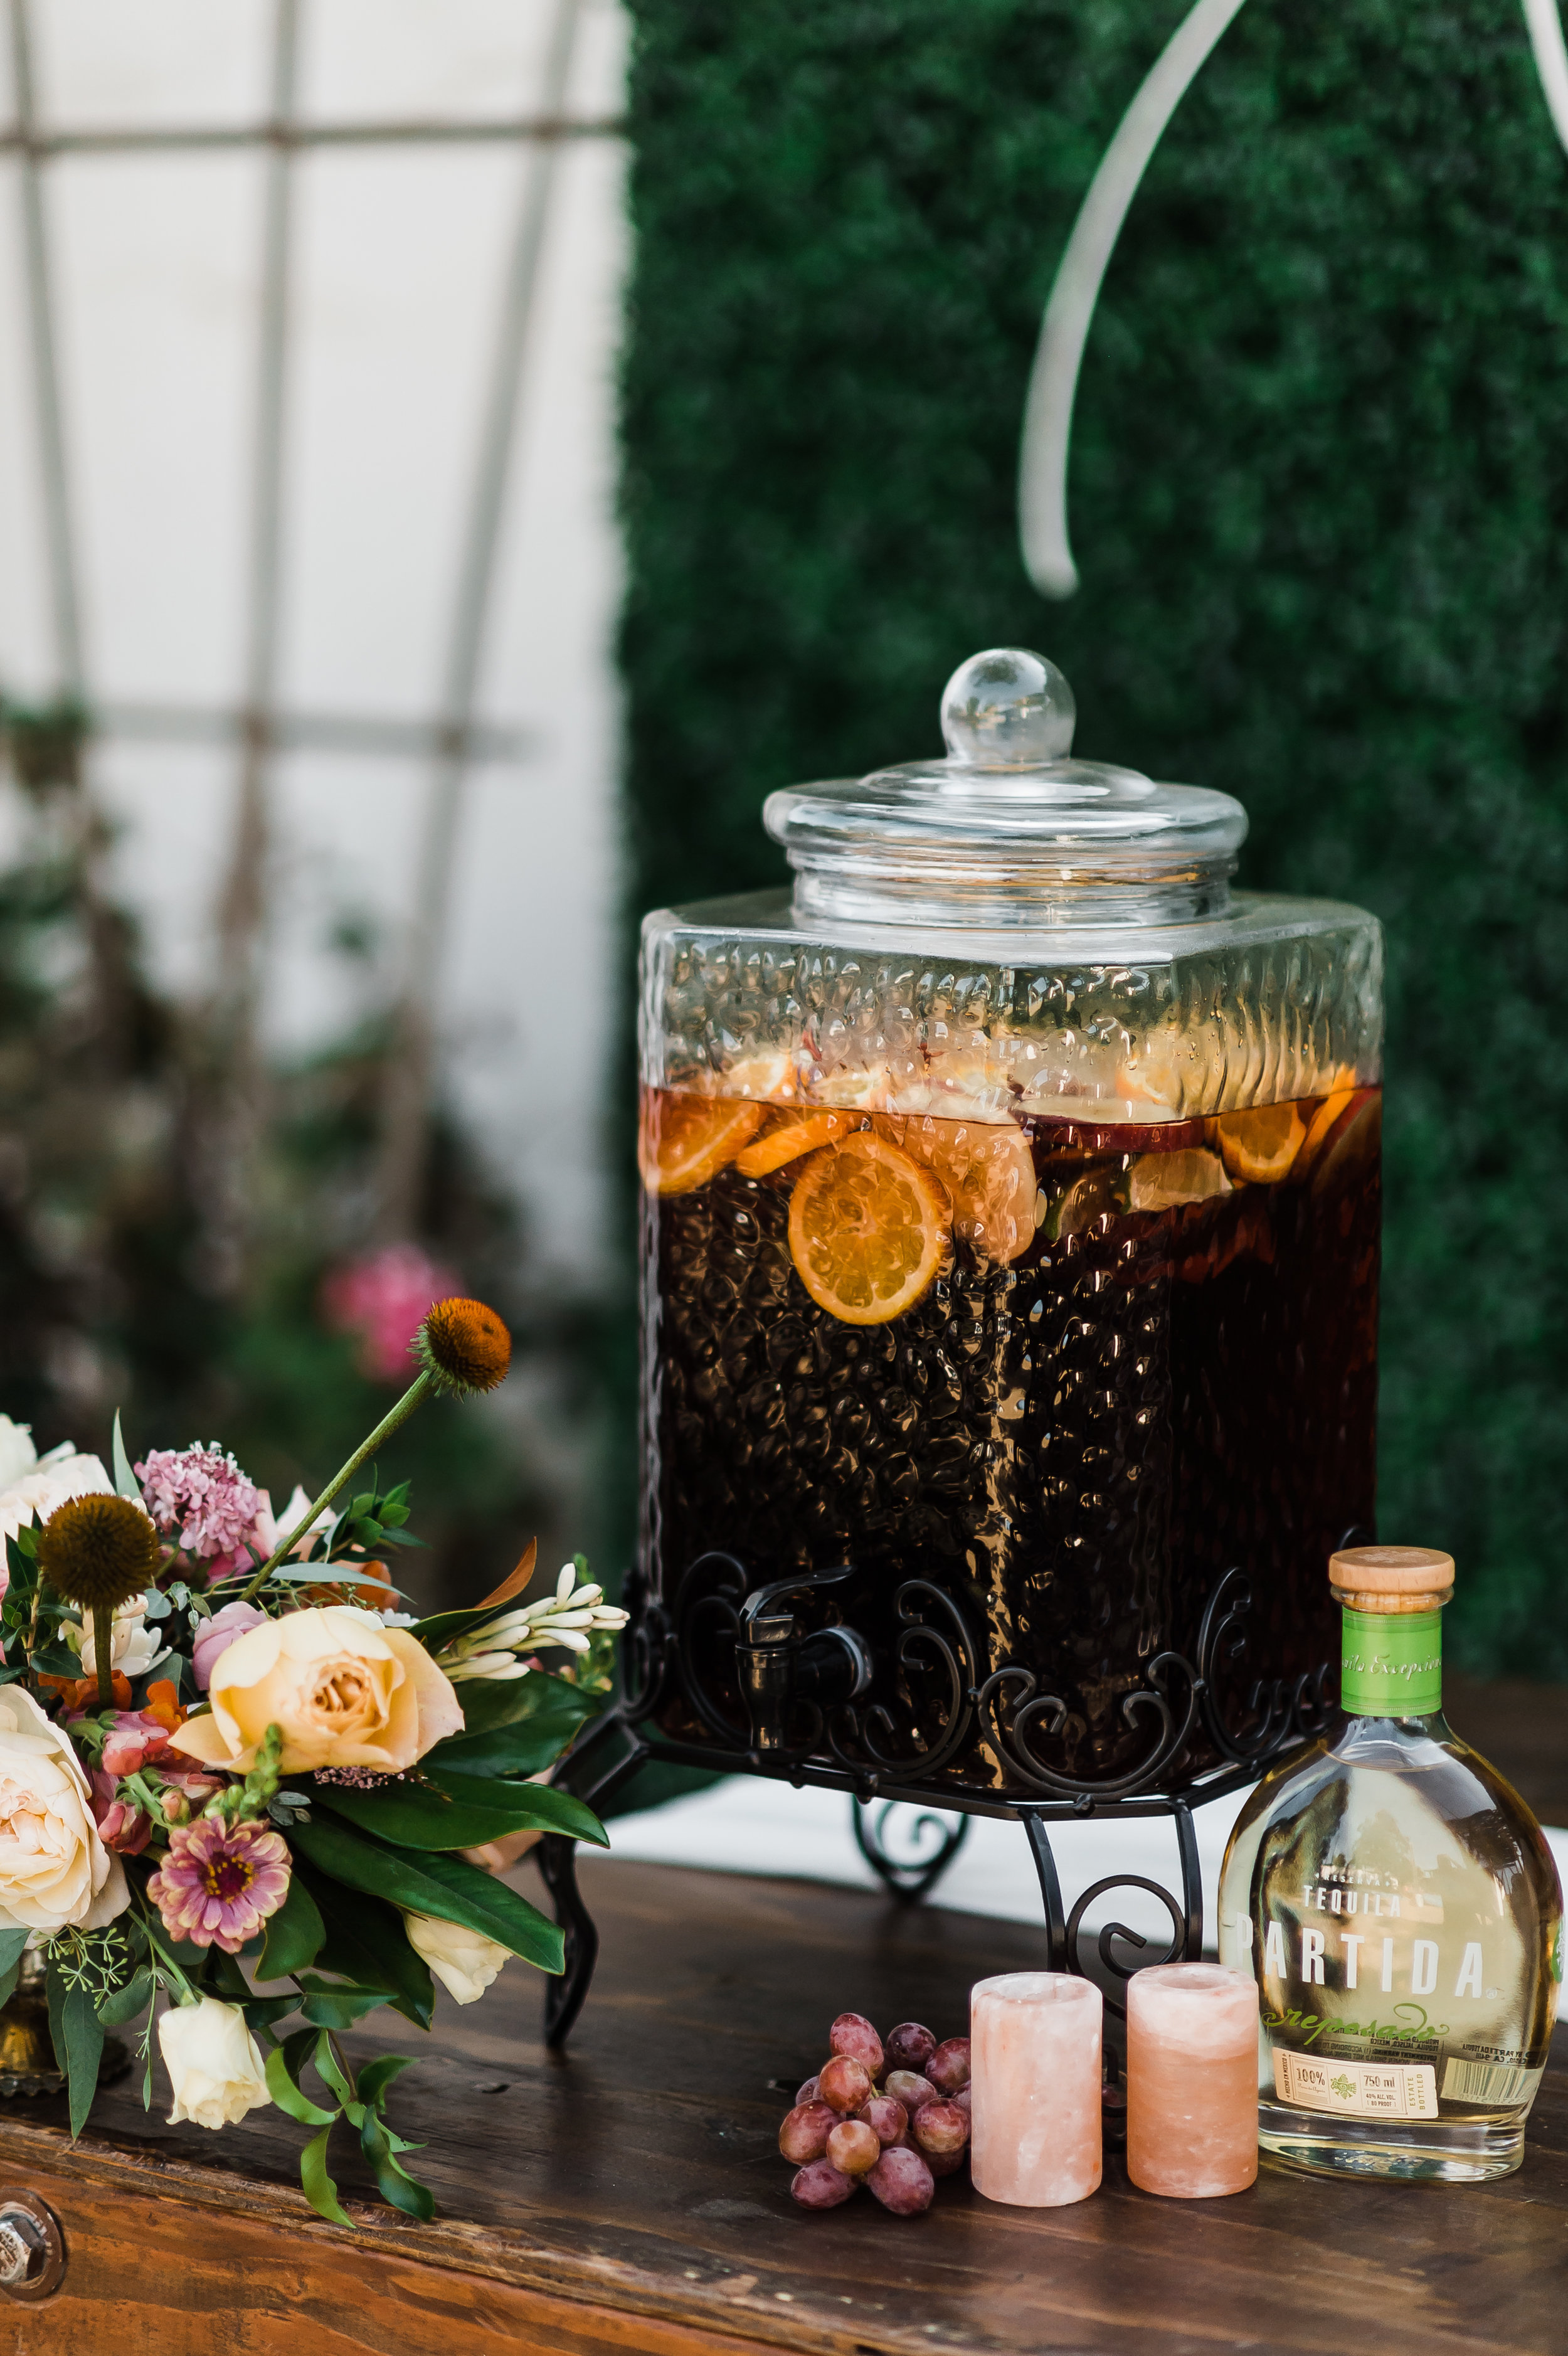 www.santabarbarawedding.com | Michelle Ramirez Photography | Olivas Adobe | Karen Marie Events | Tangled Lotus | Amigo Party Rentals | Refreshments for the Guests